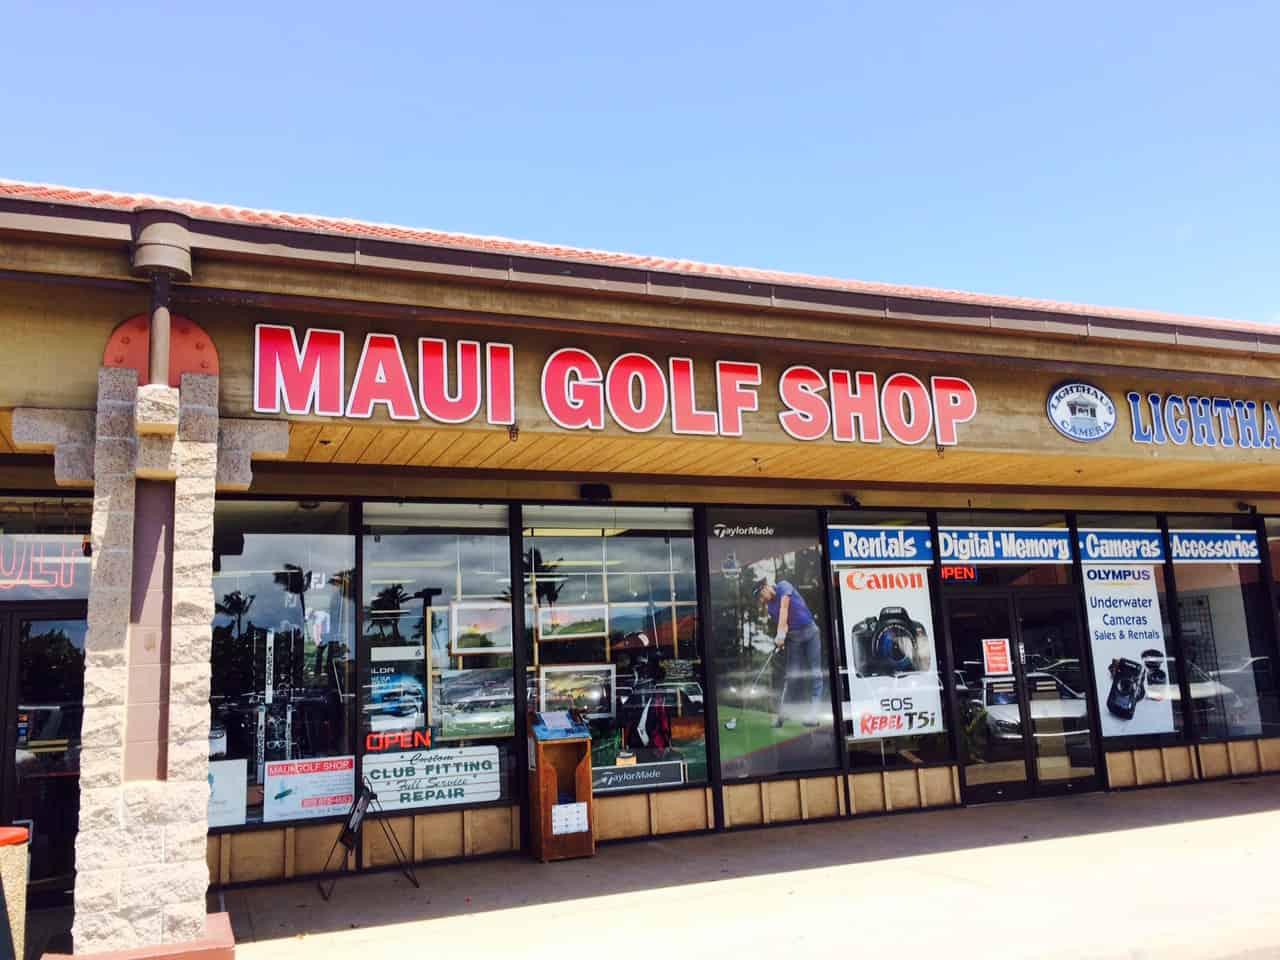 Maui Golf Shop